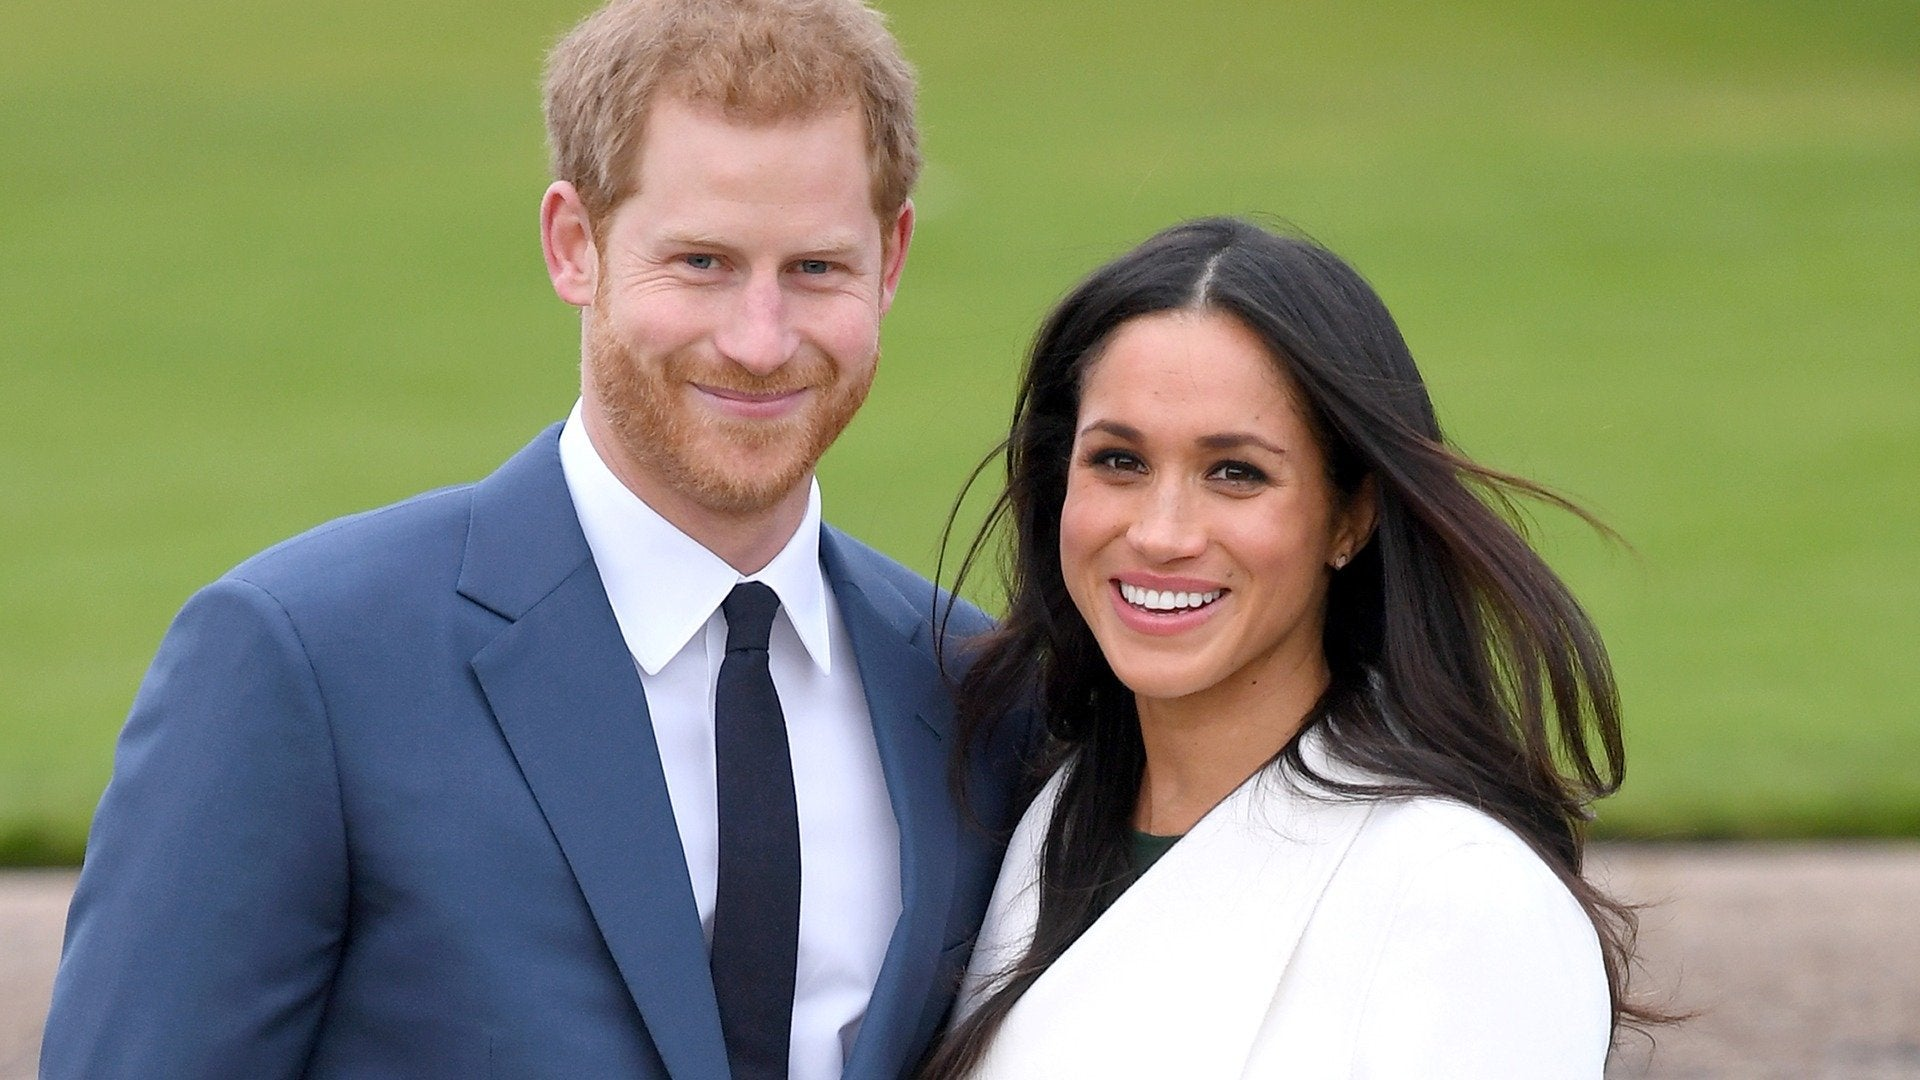 The Royal Wedding Highlights: Harry and Meghan